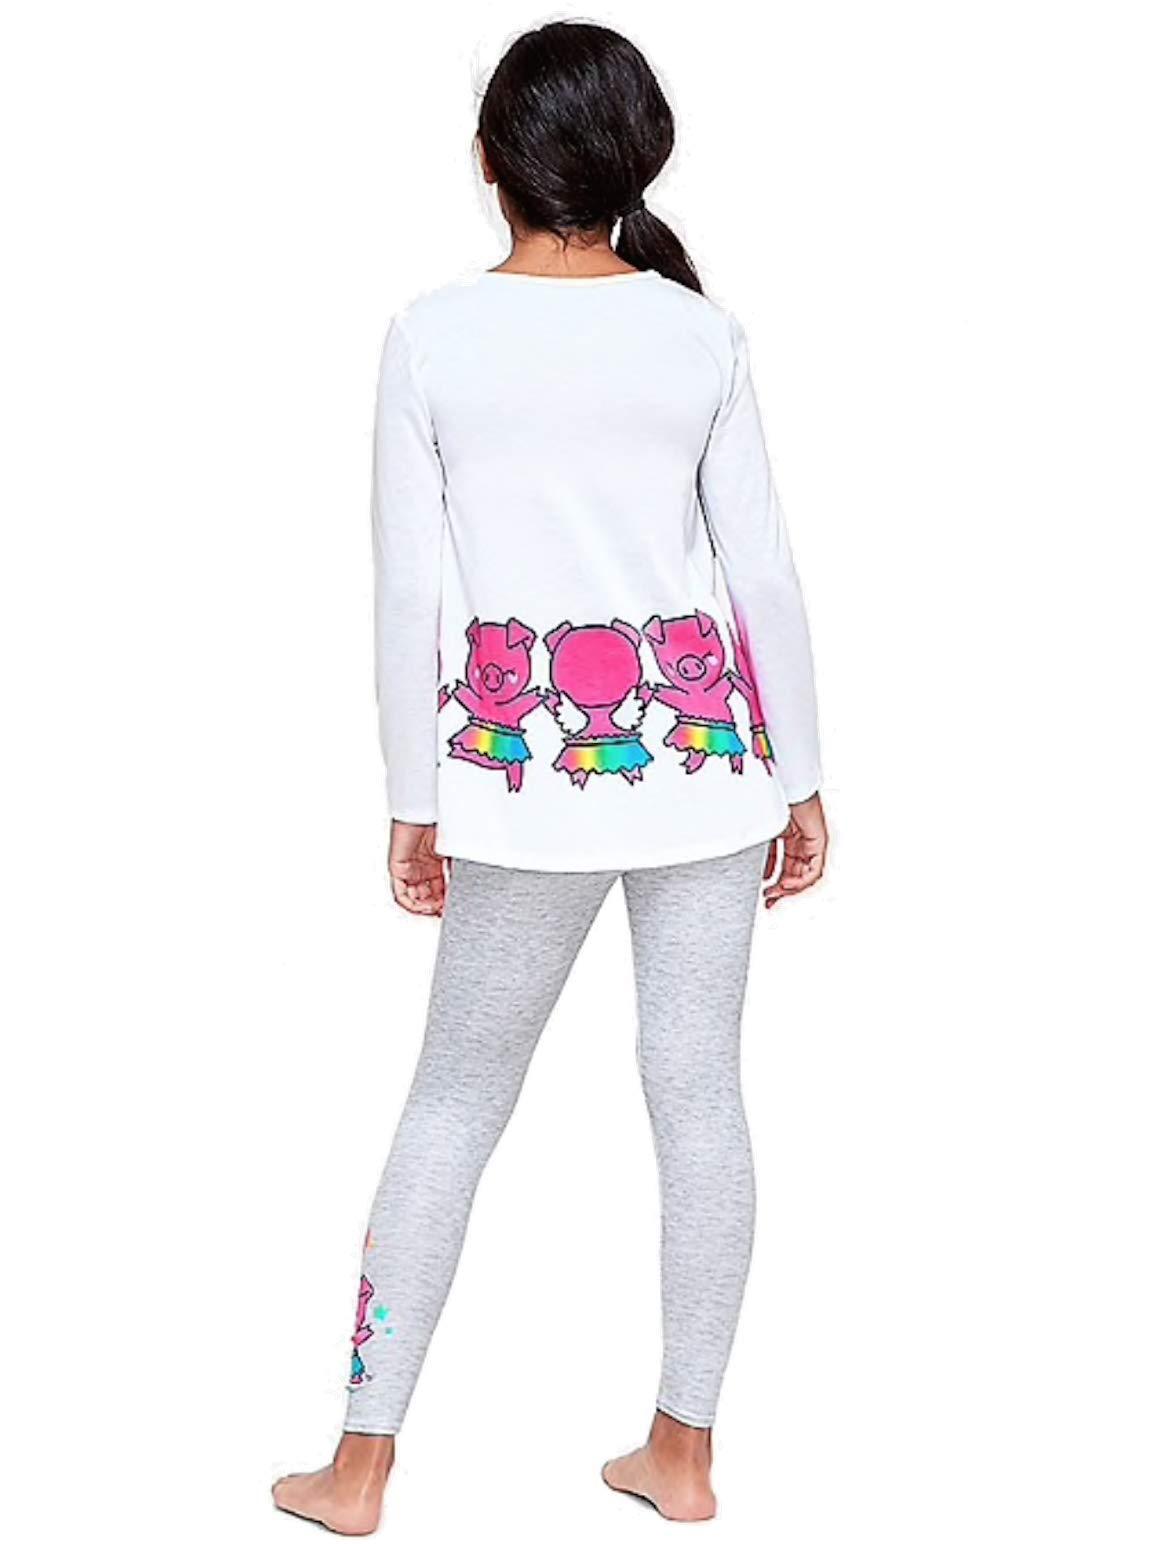 Justice Girls Nightgown, or Pajama Set Top & Pants Bundle (Pig Make Everyday Fun, 8) by Generic (Image #2)